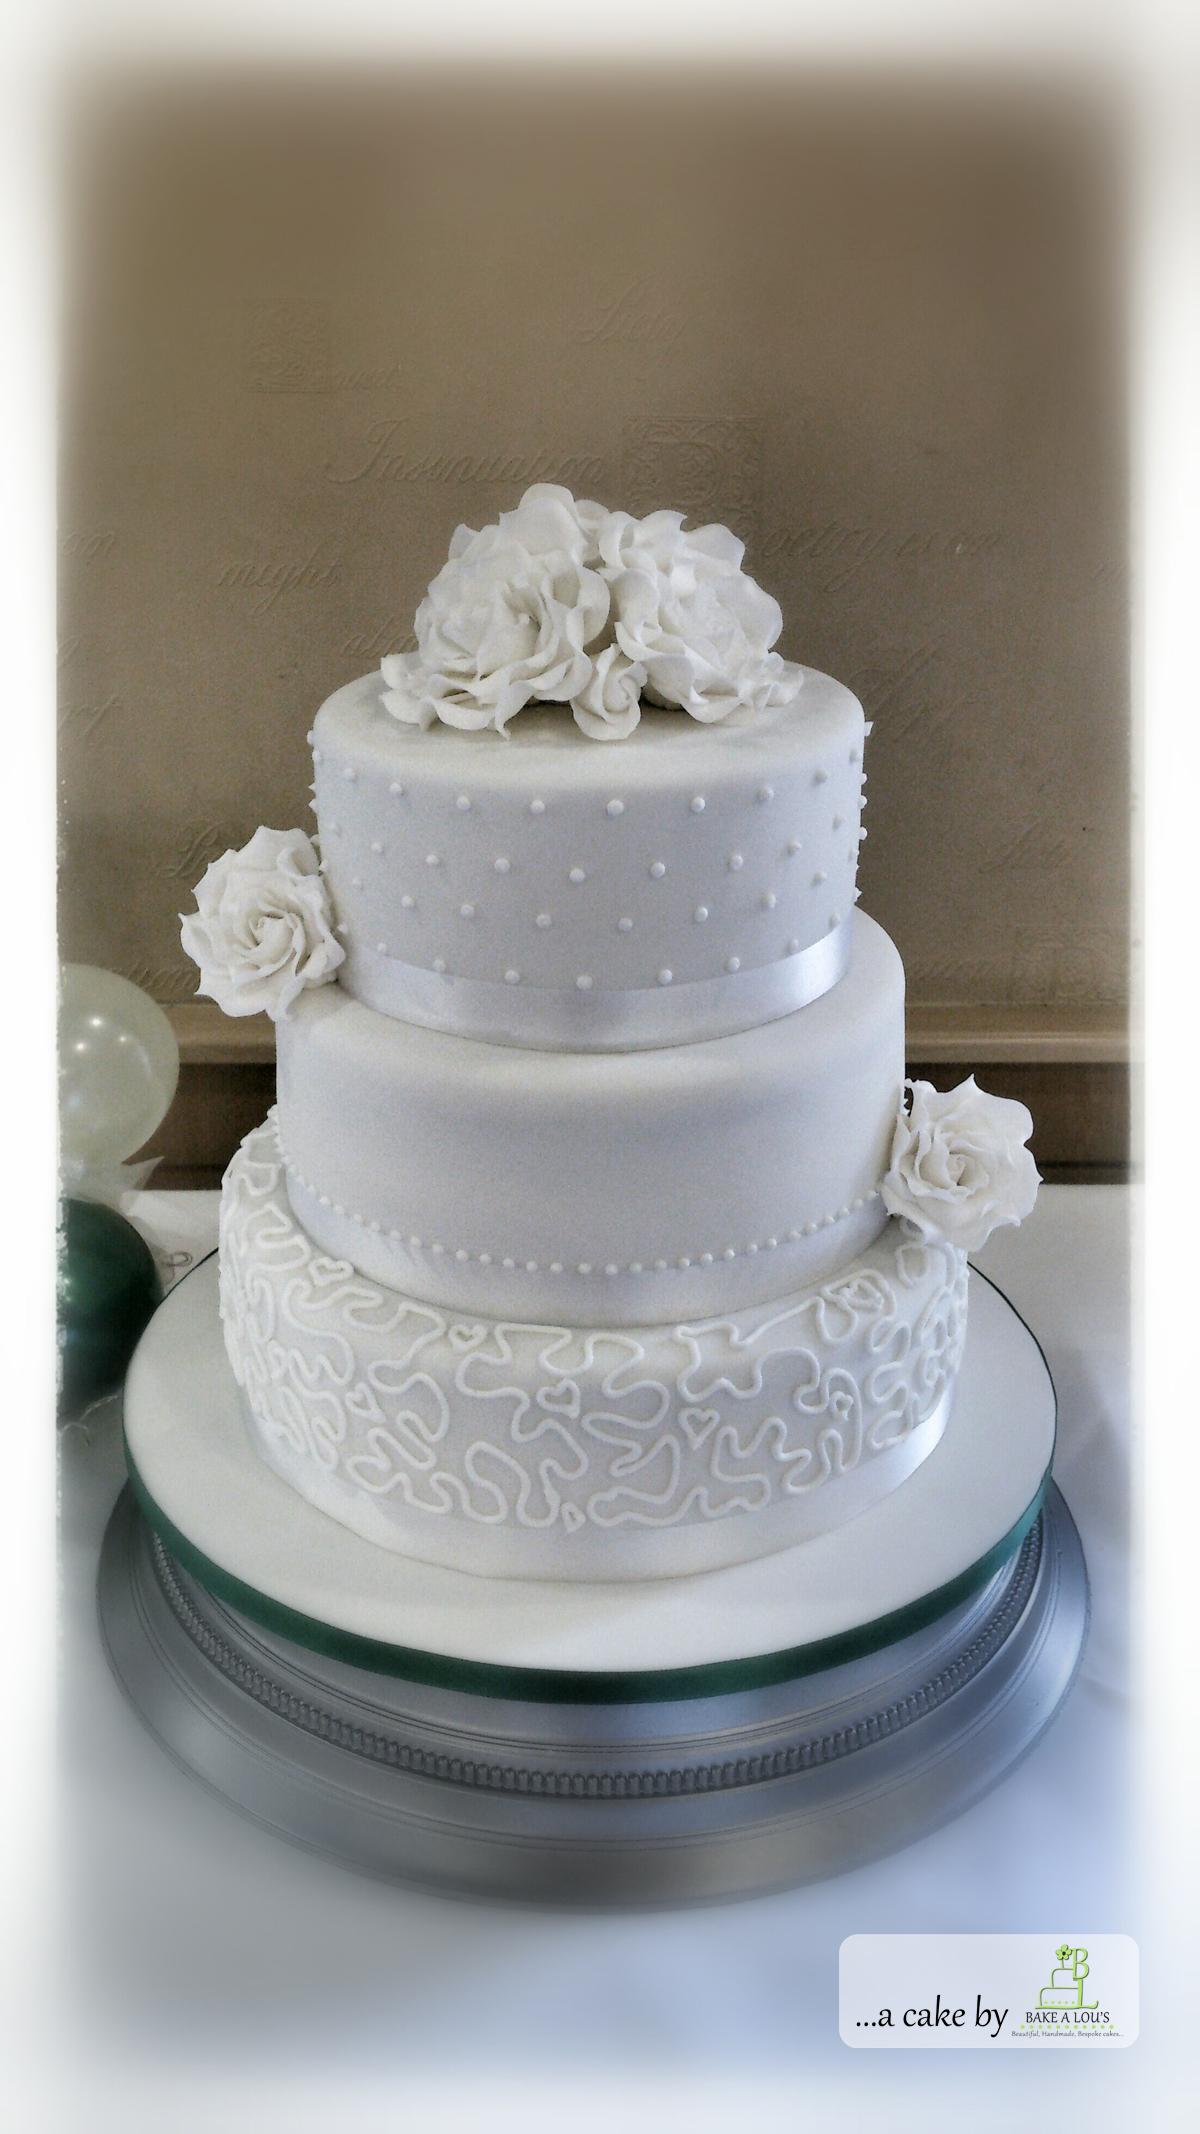 Elegant Wedding Cakes Related Keywords & Suggestions